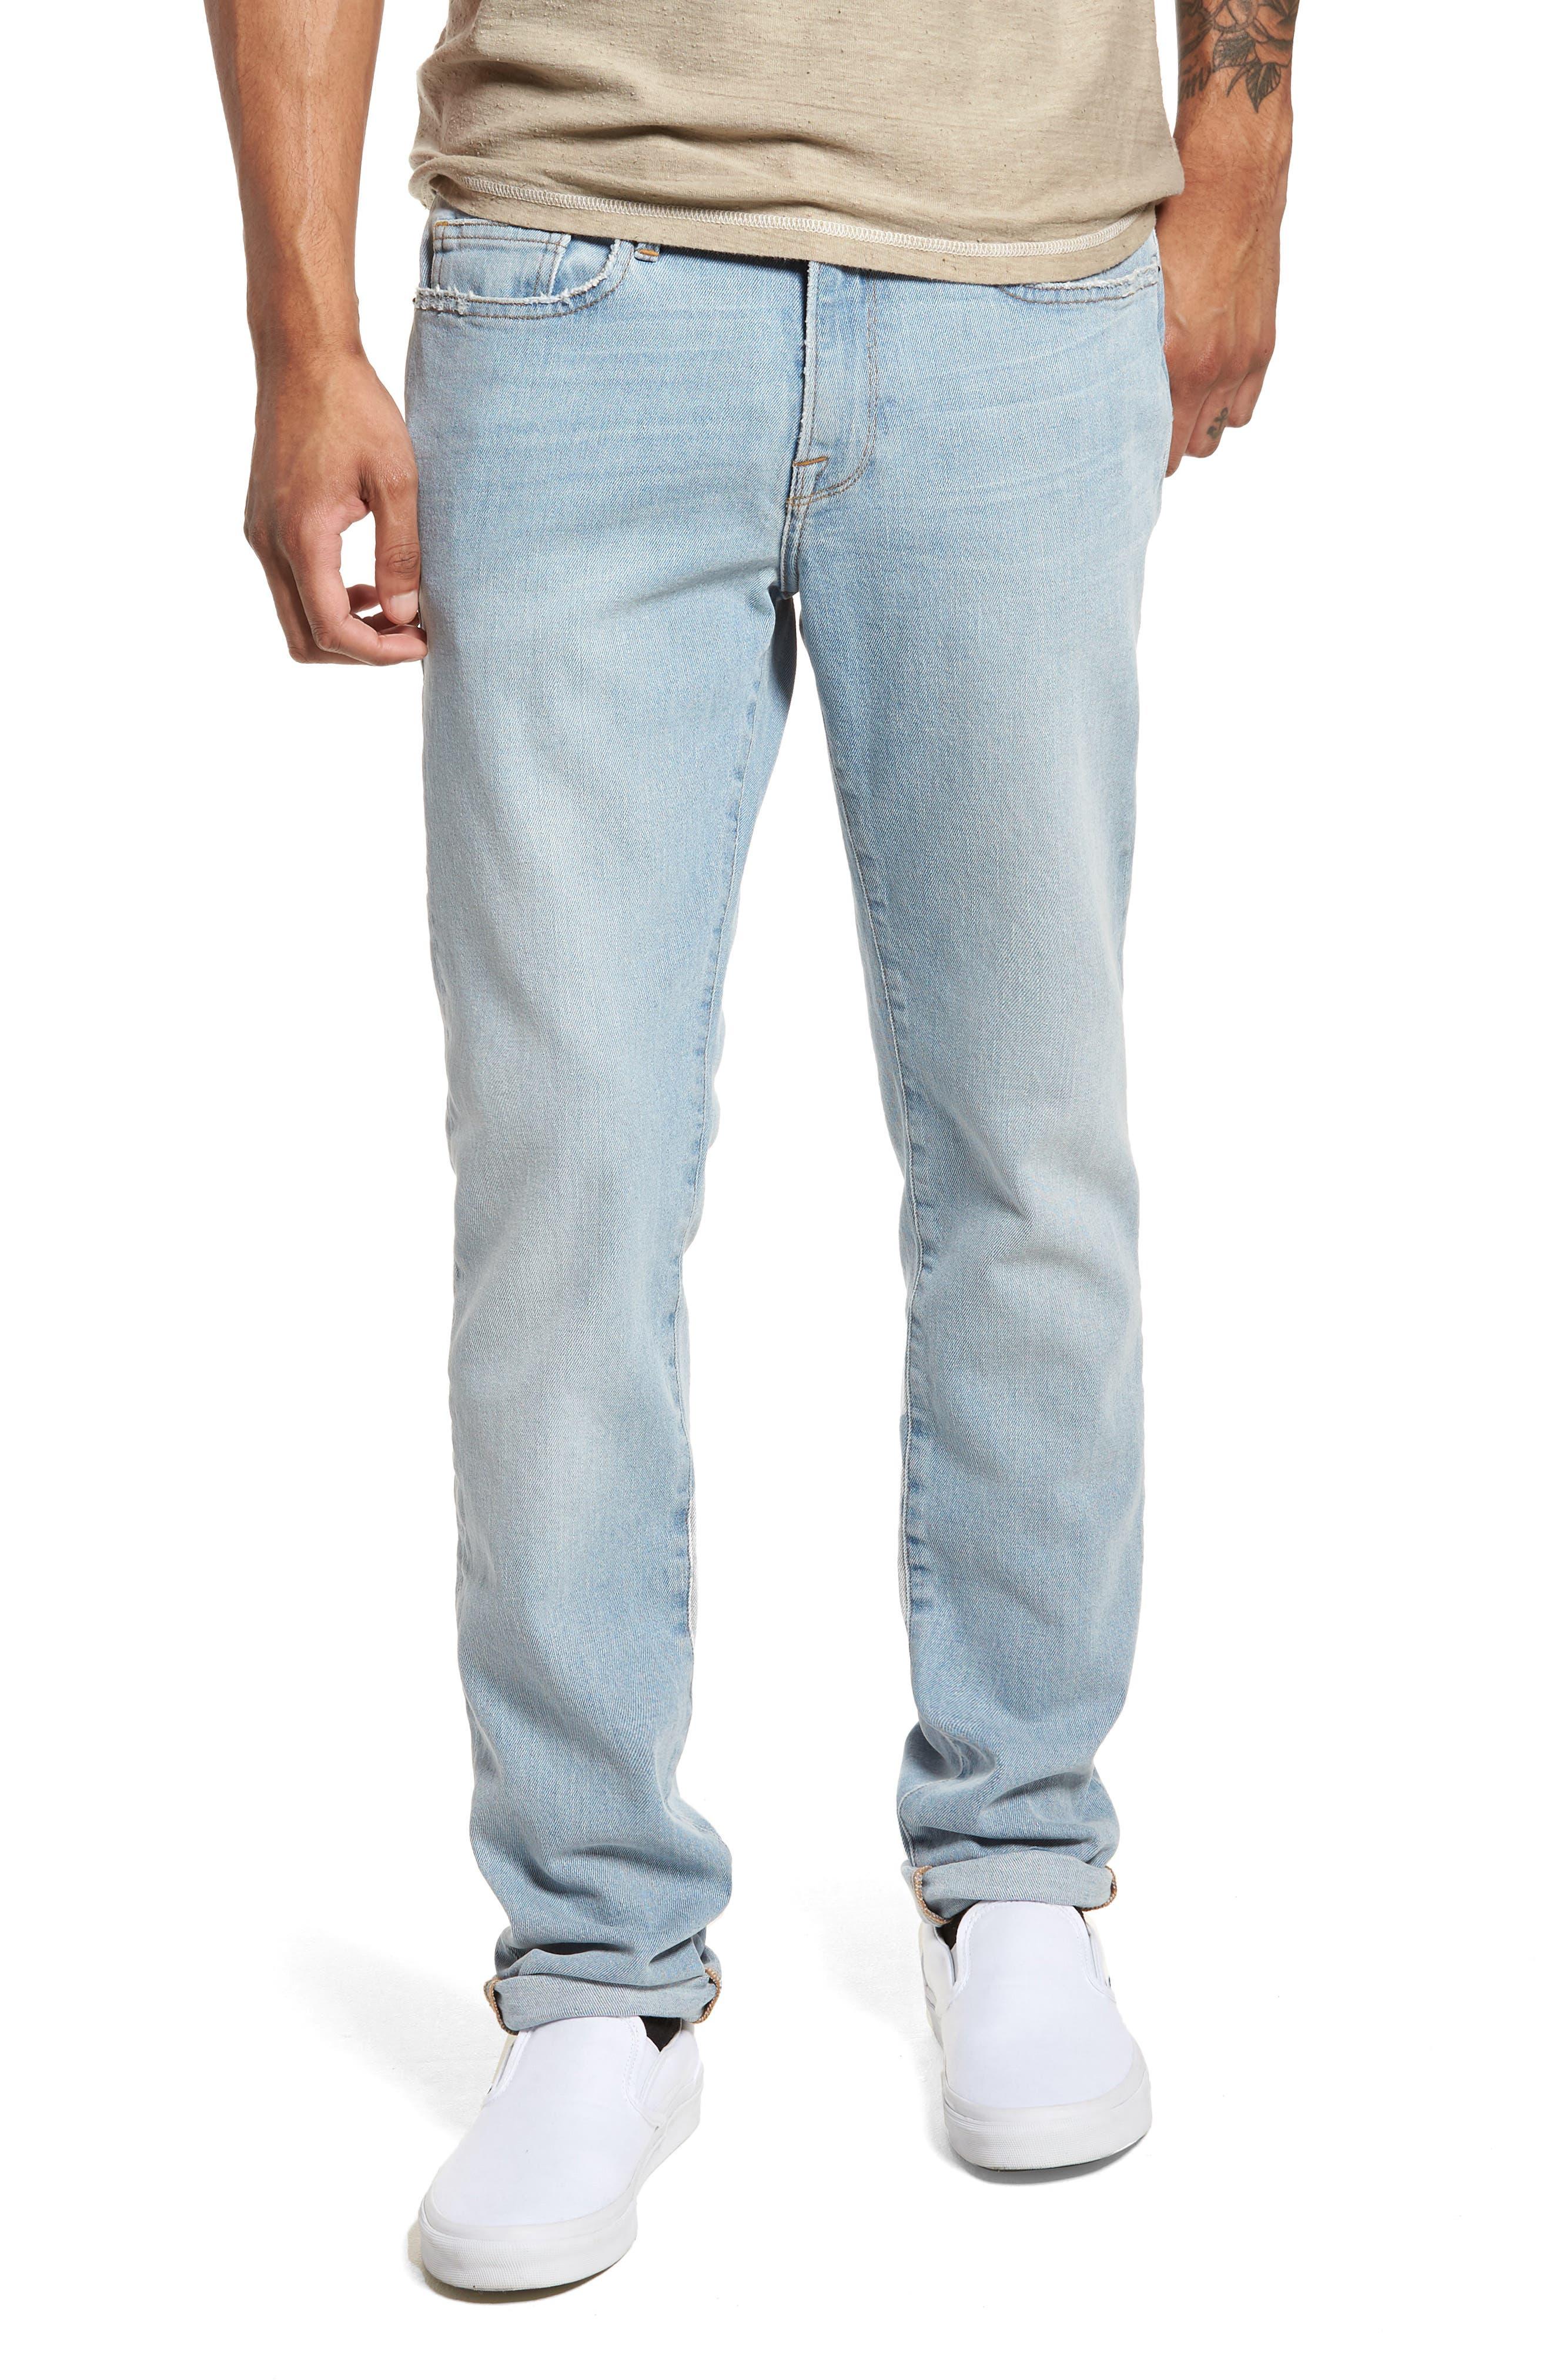 L'Homme Skinny Fit Jeans,                         Main,                         color, Arnett